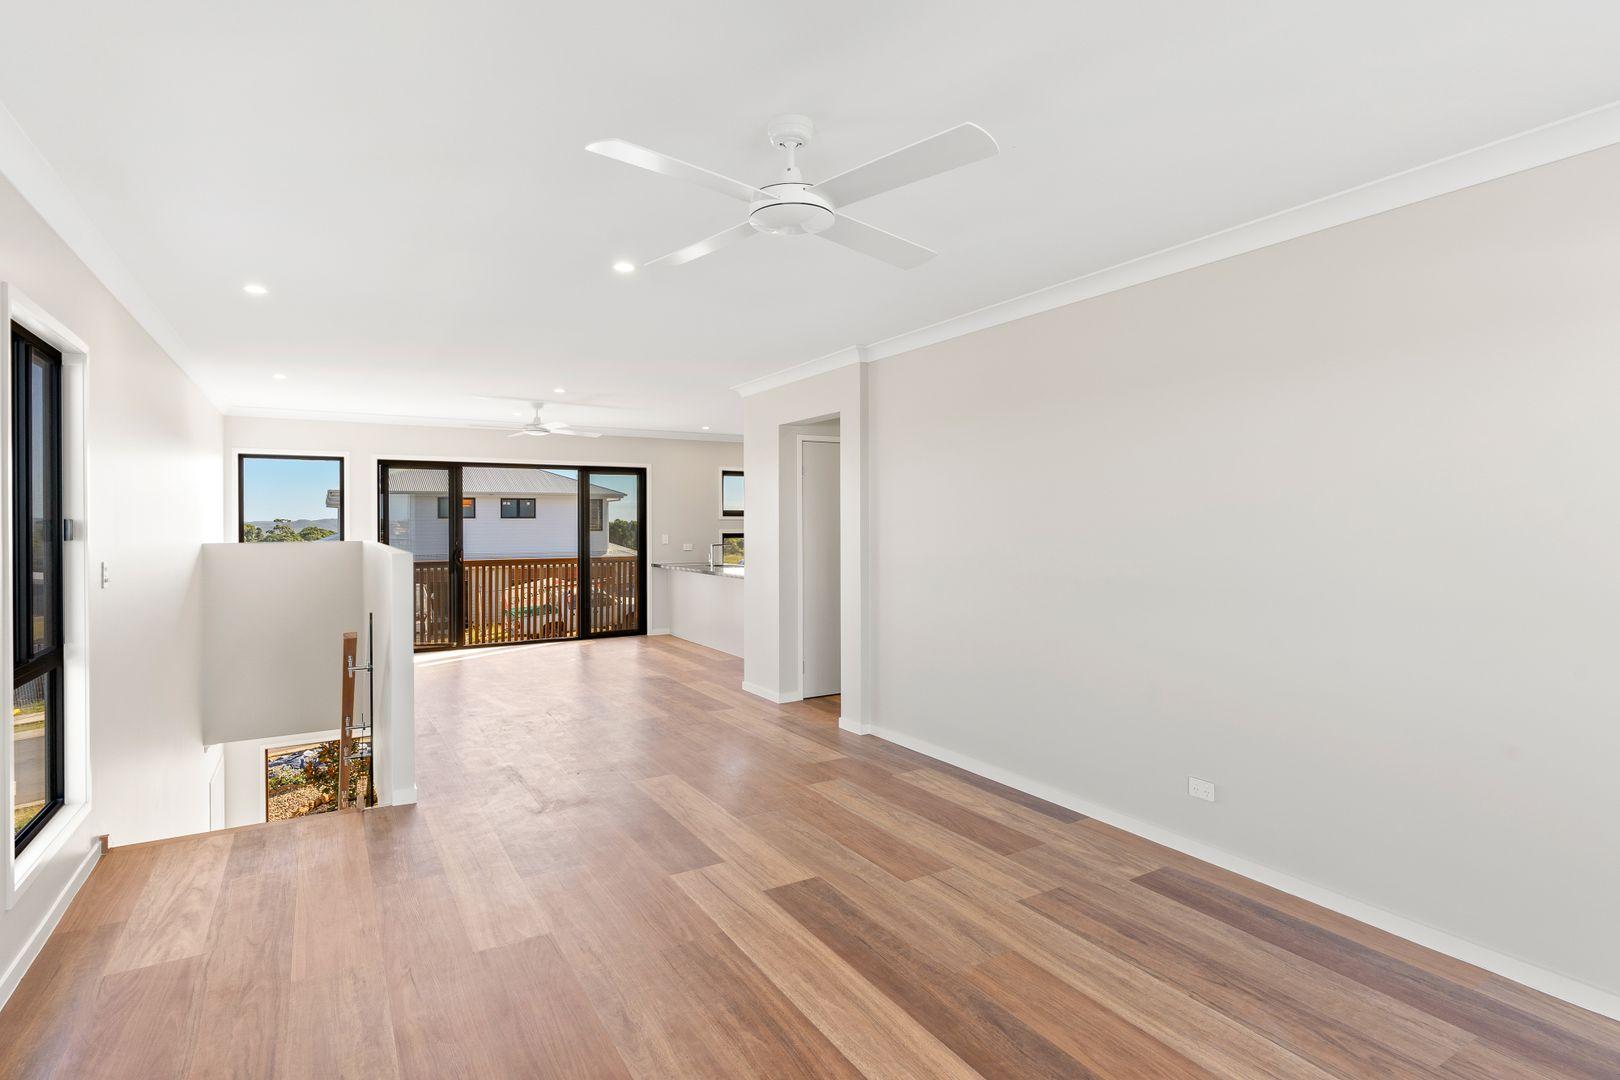 59A Stoneyhurst Drive, Lennox Head NSW 2478, Image 2